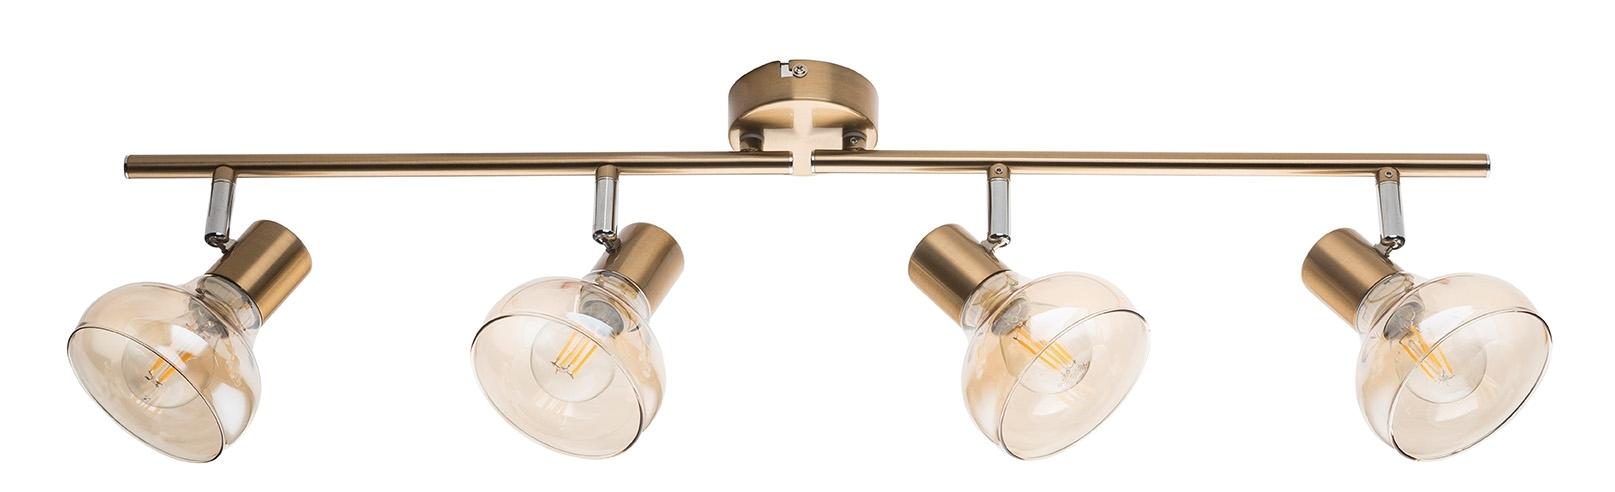 Globo DONTO Strahler Metall Goldfarben, 54922-4 | Lampen > Strahler und Systeme > Strahler und Spots | Goldfarben | Metall